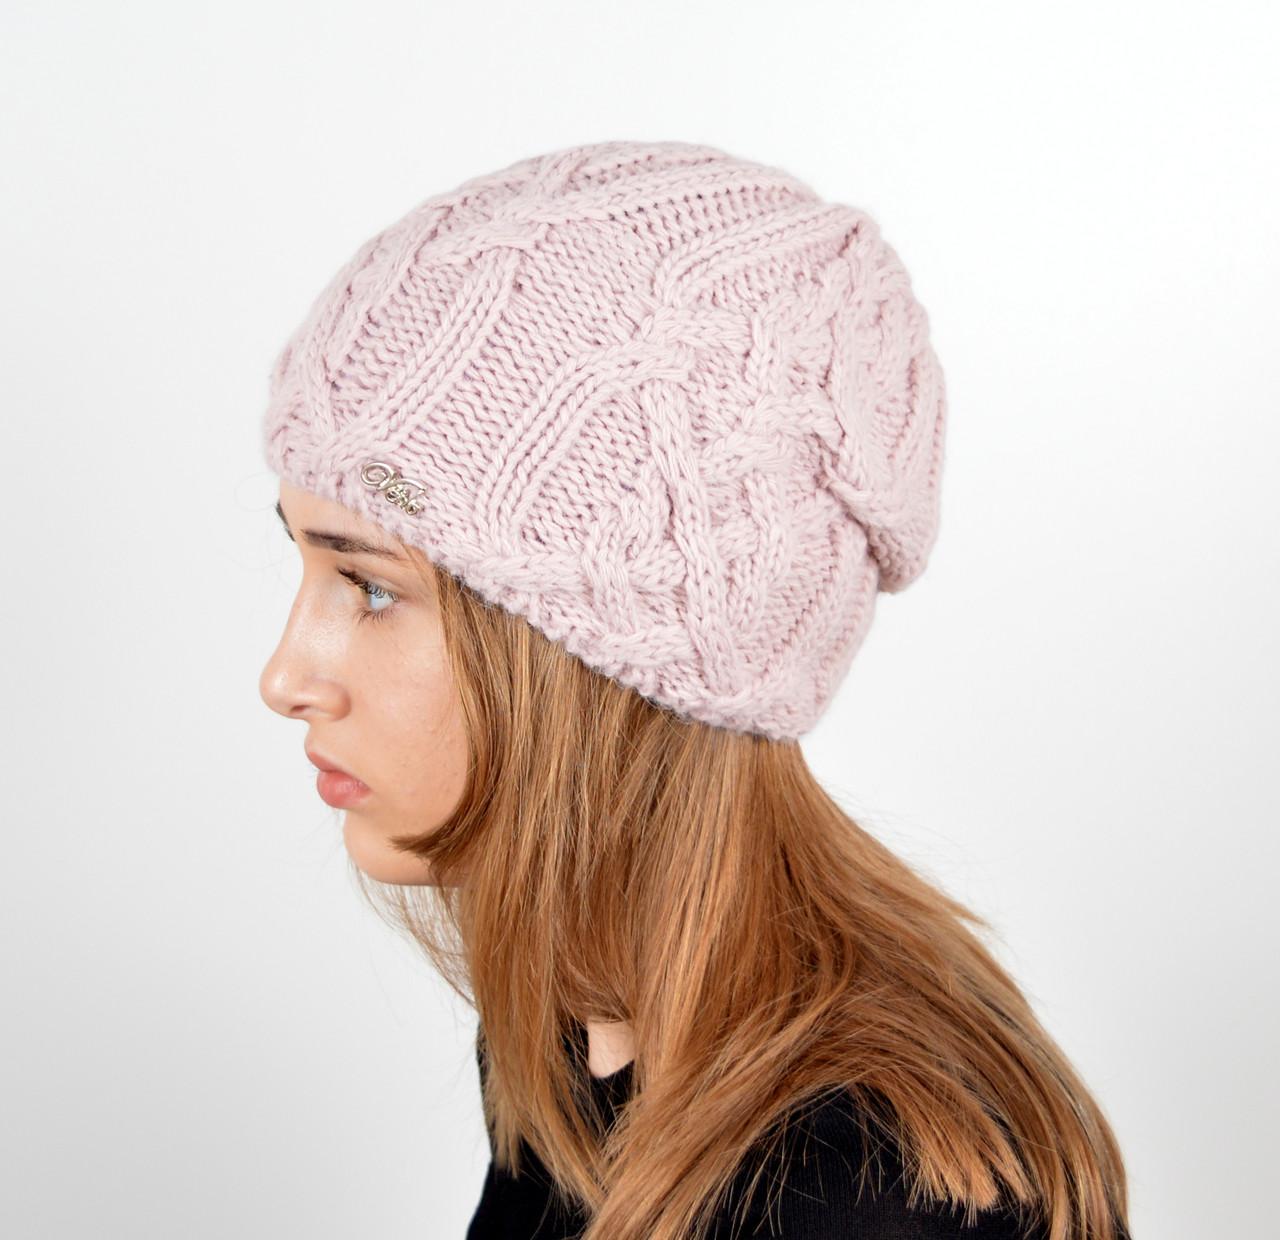 Женская шапка veilo на флисе 3332 пудра